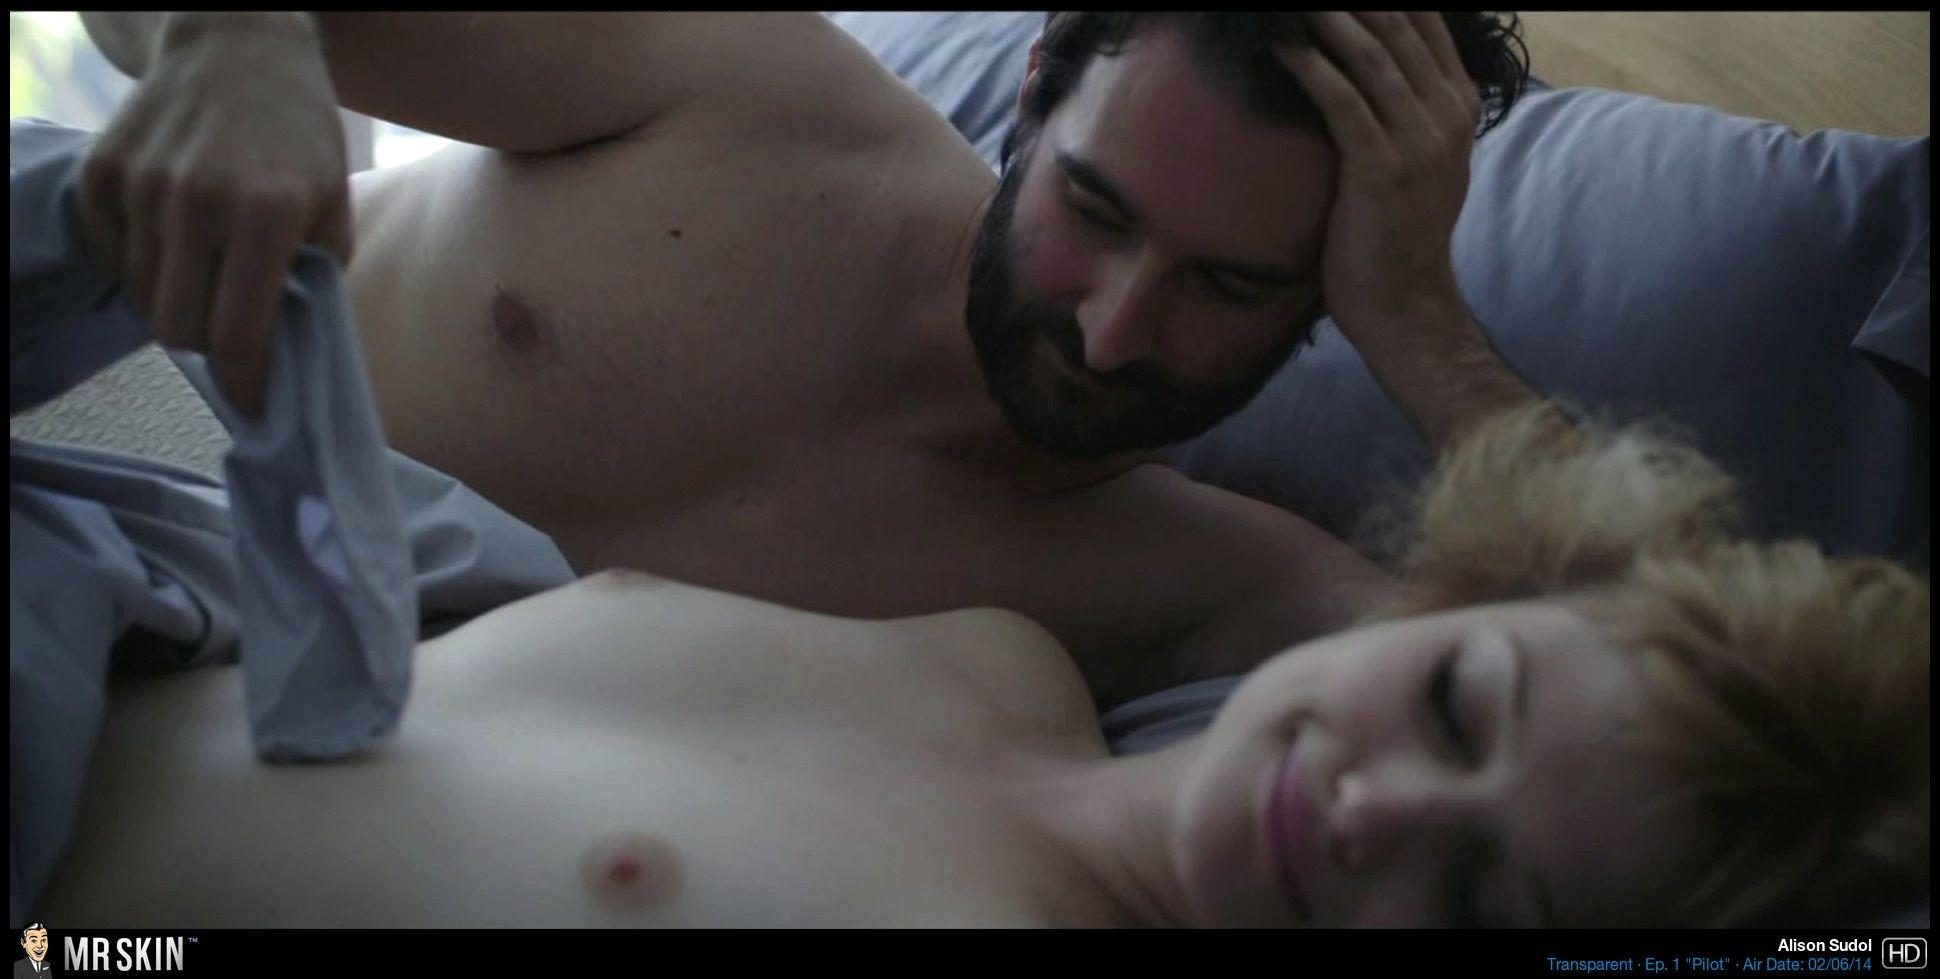 Alison sudol nude pics